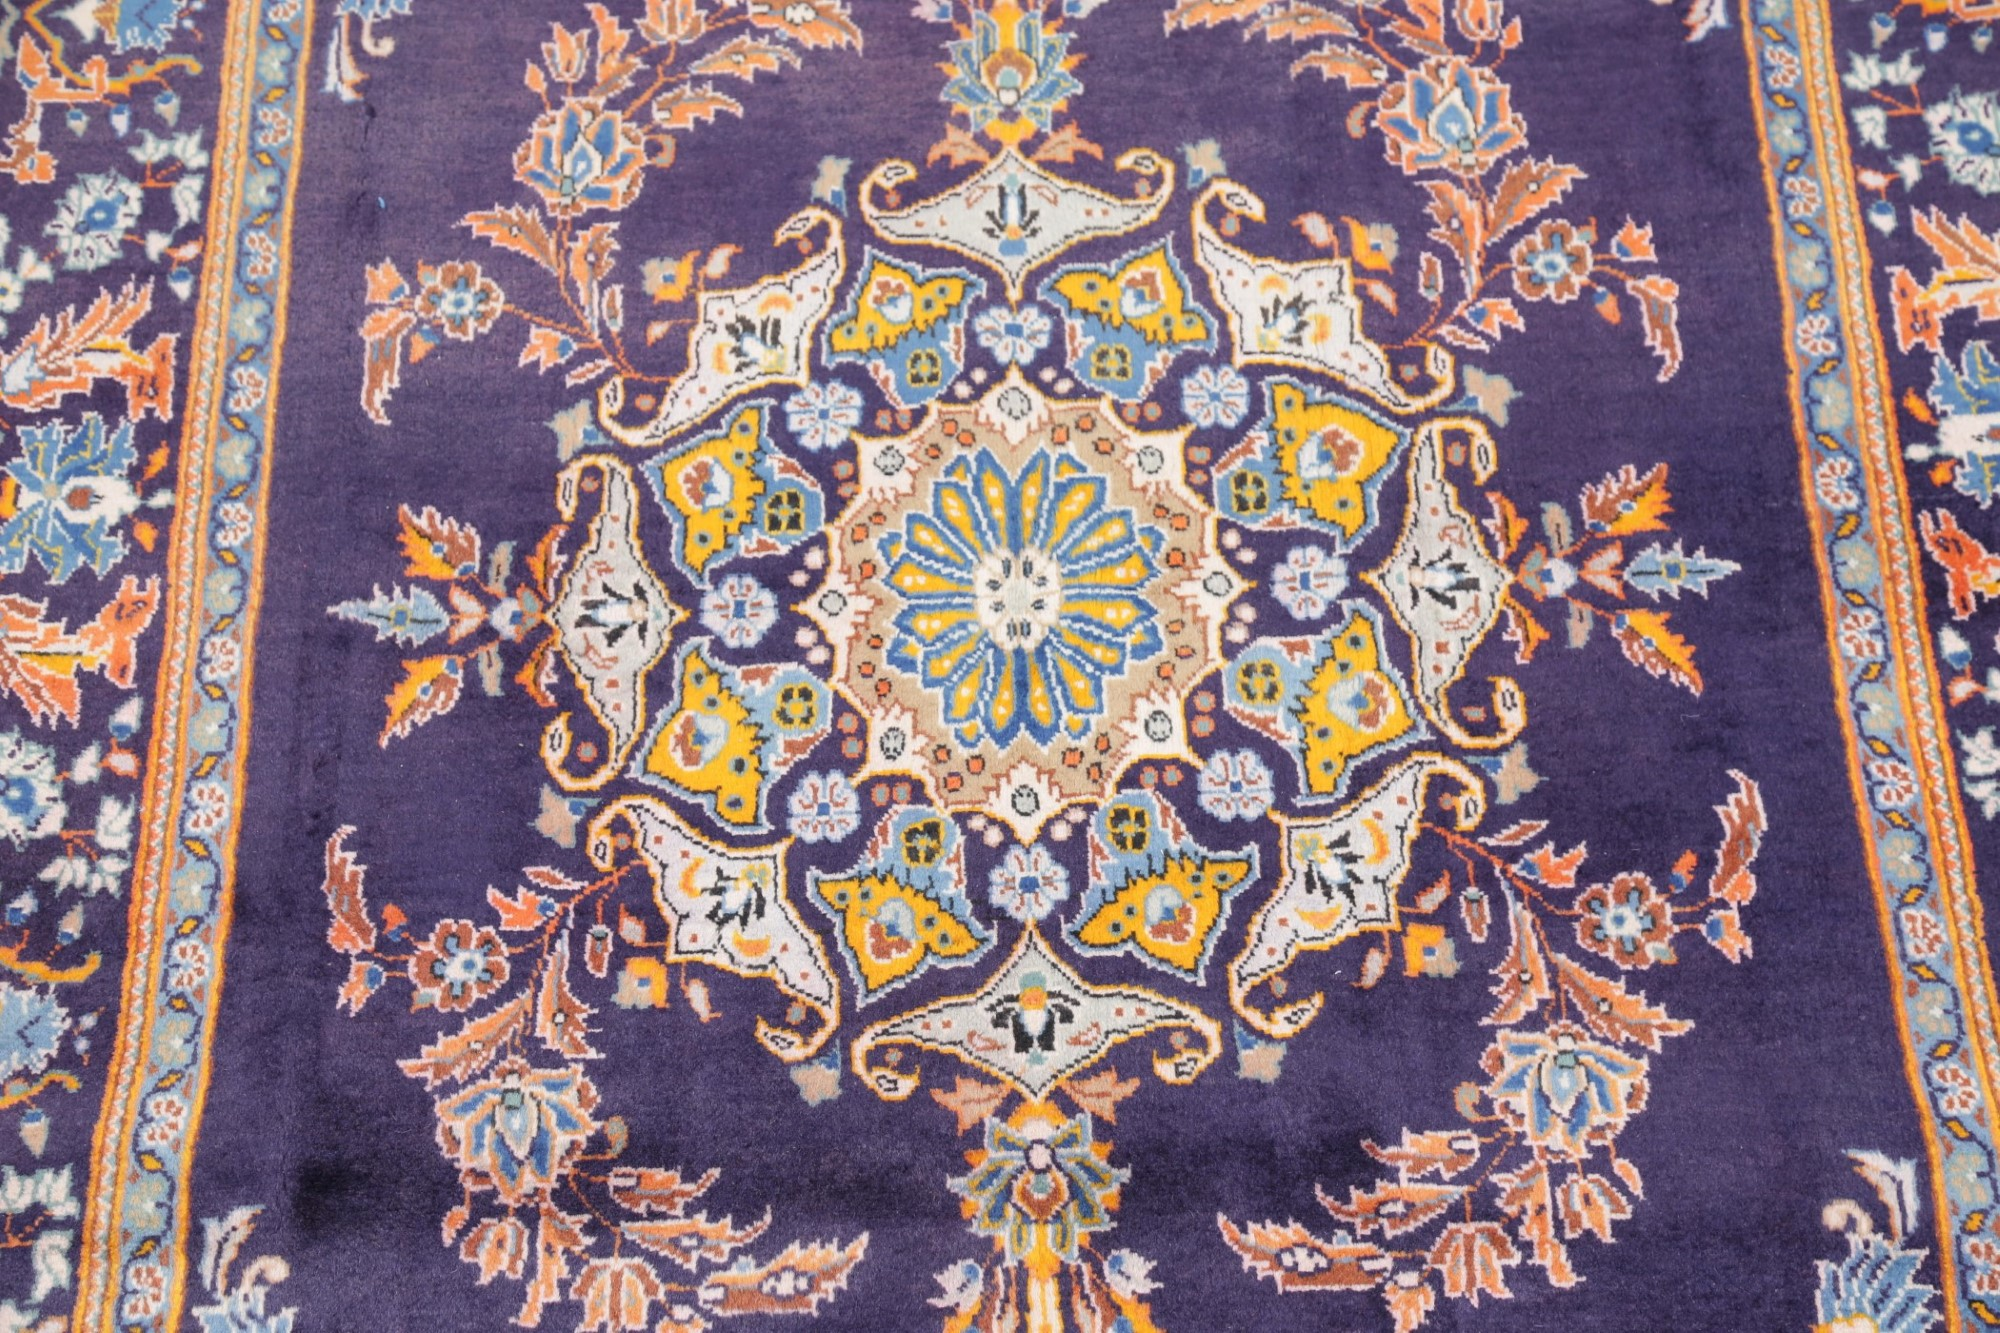 Vintage Medallion Floral Persian Oriental Area Rug Indigo